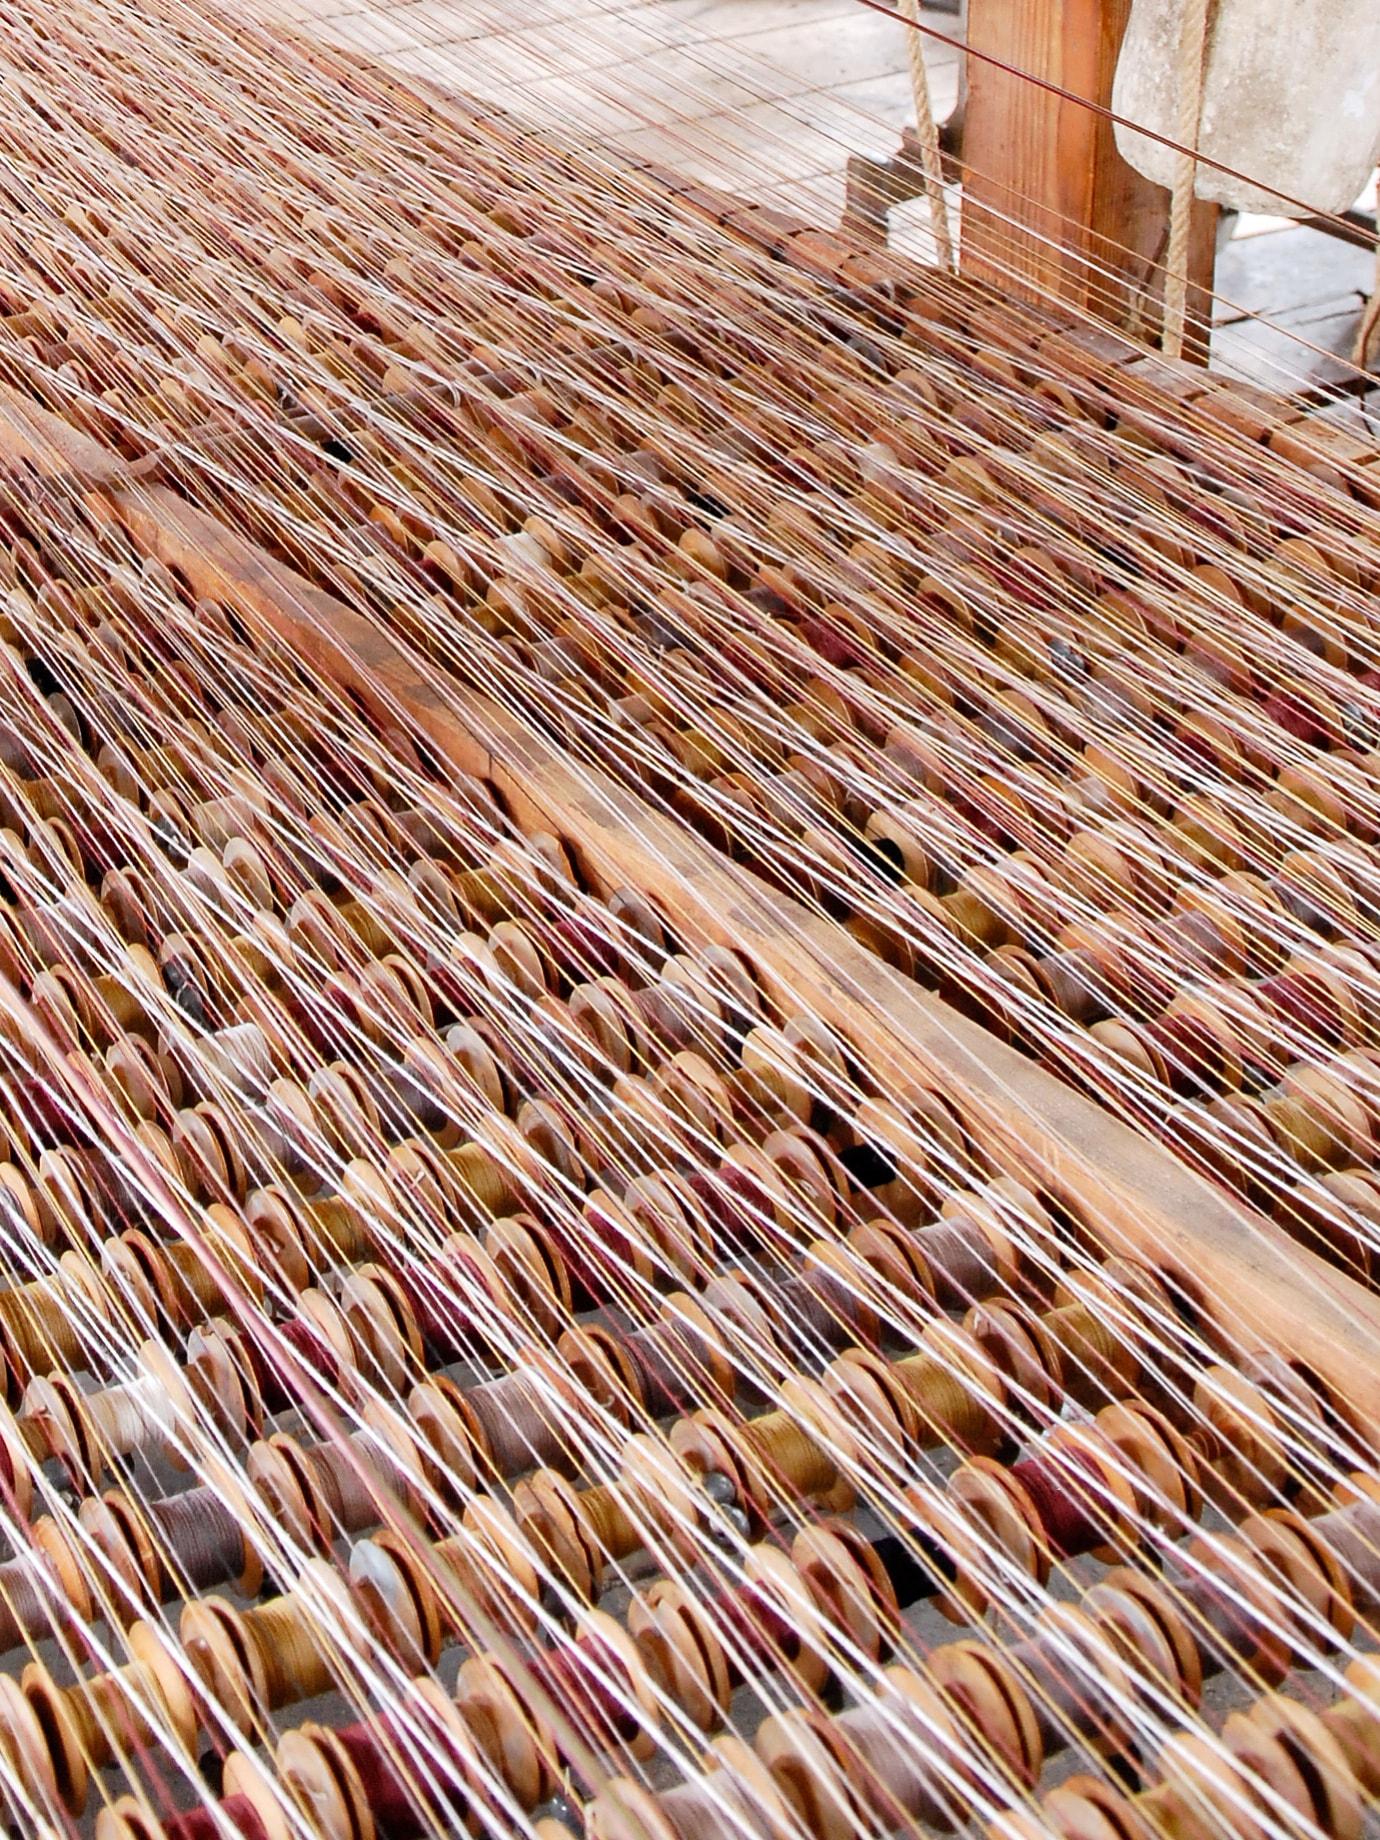 A detail of a weaving machine.